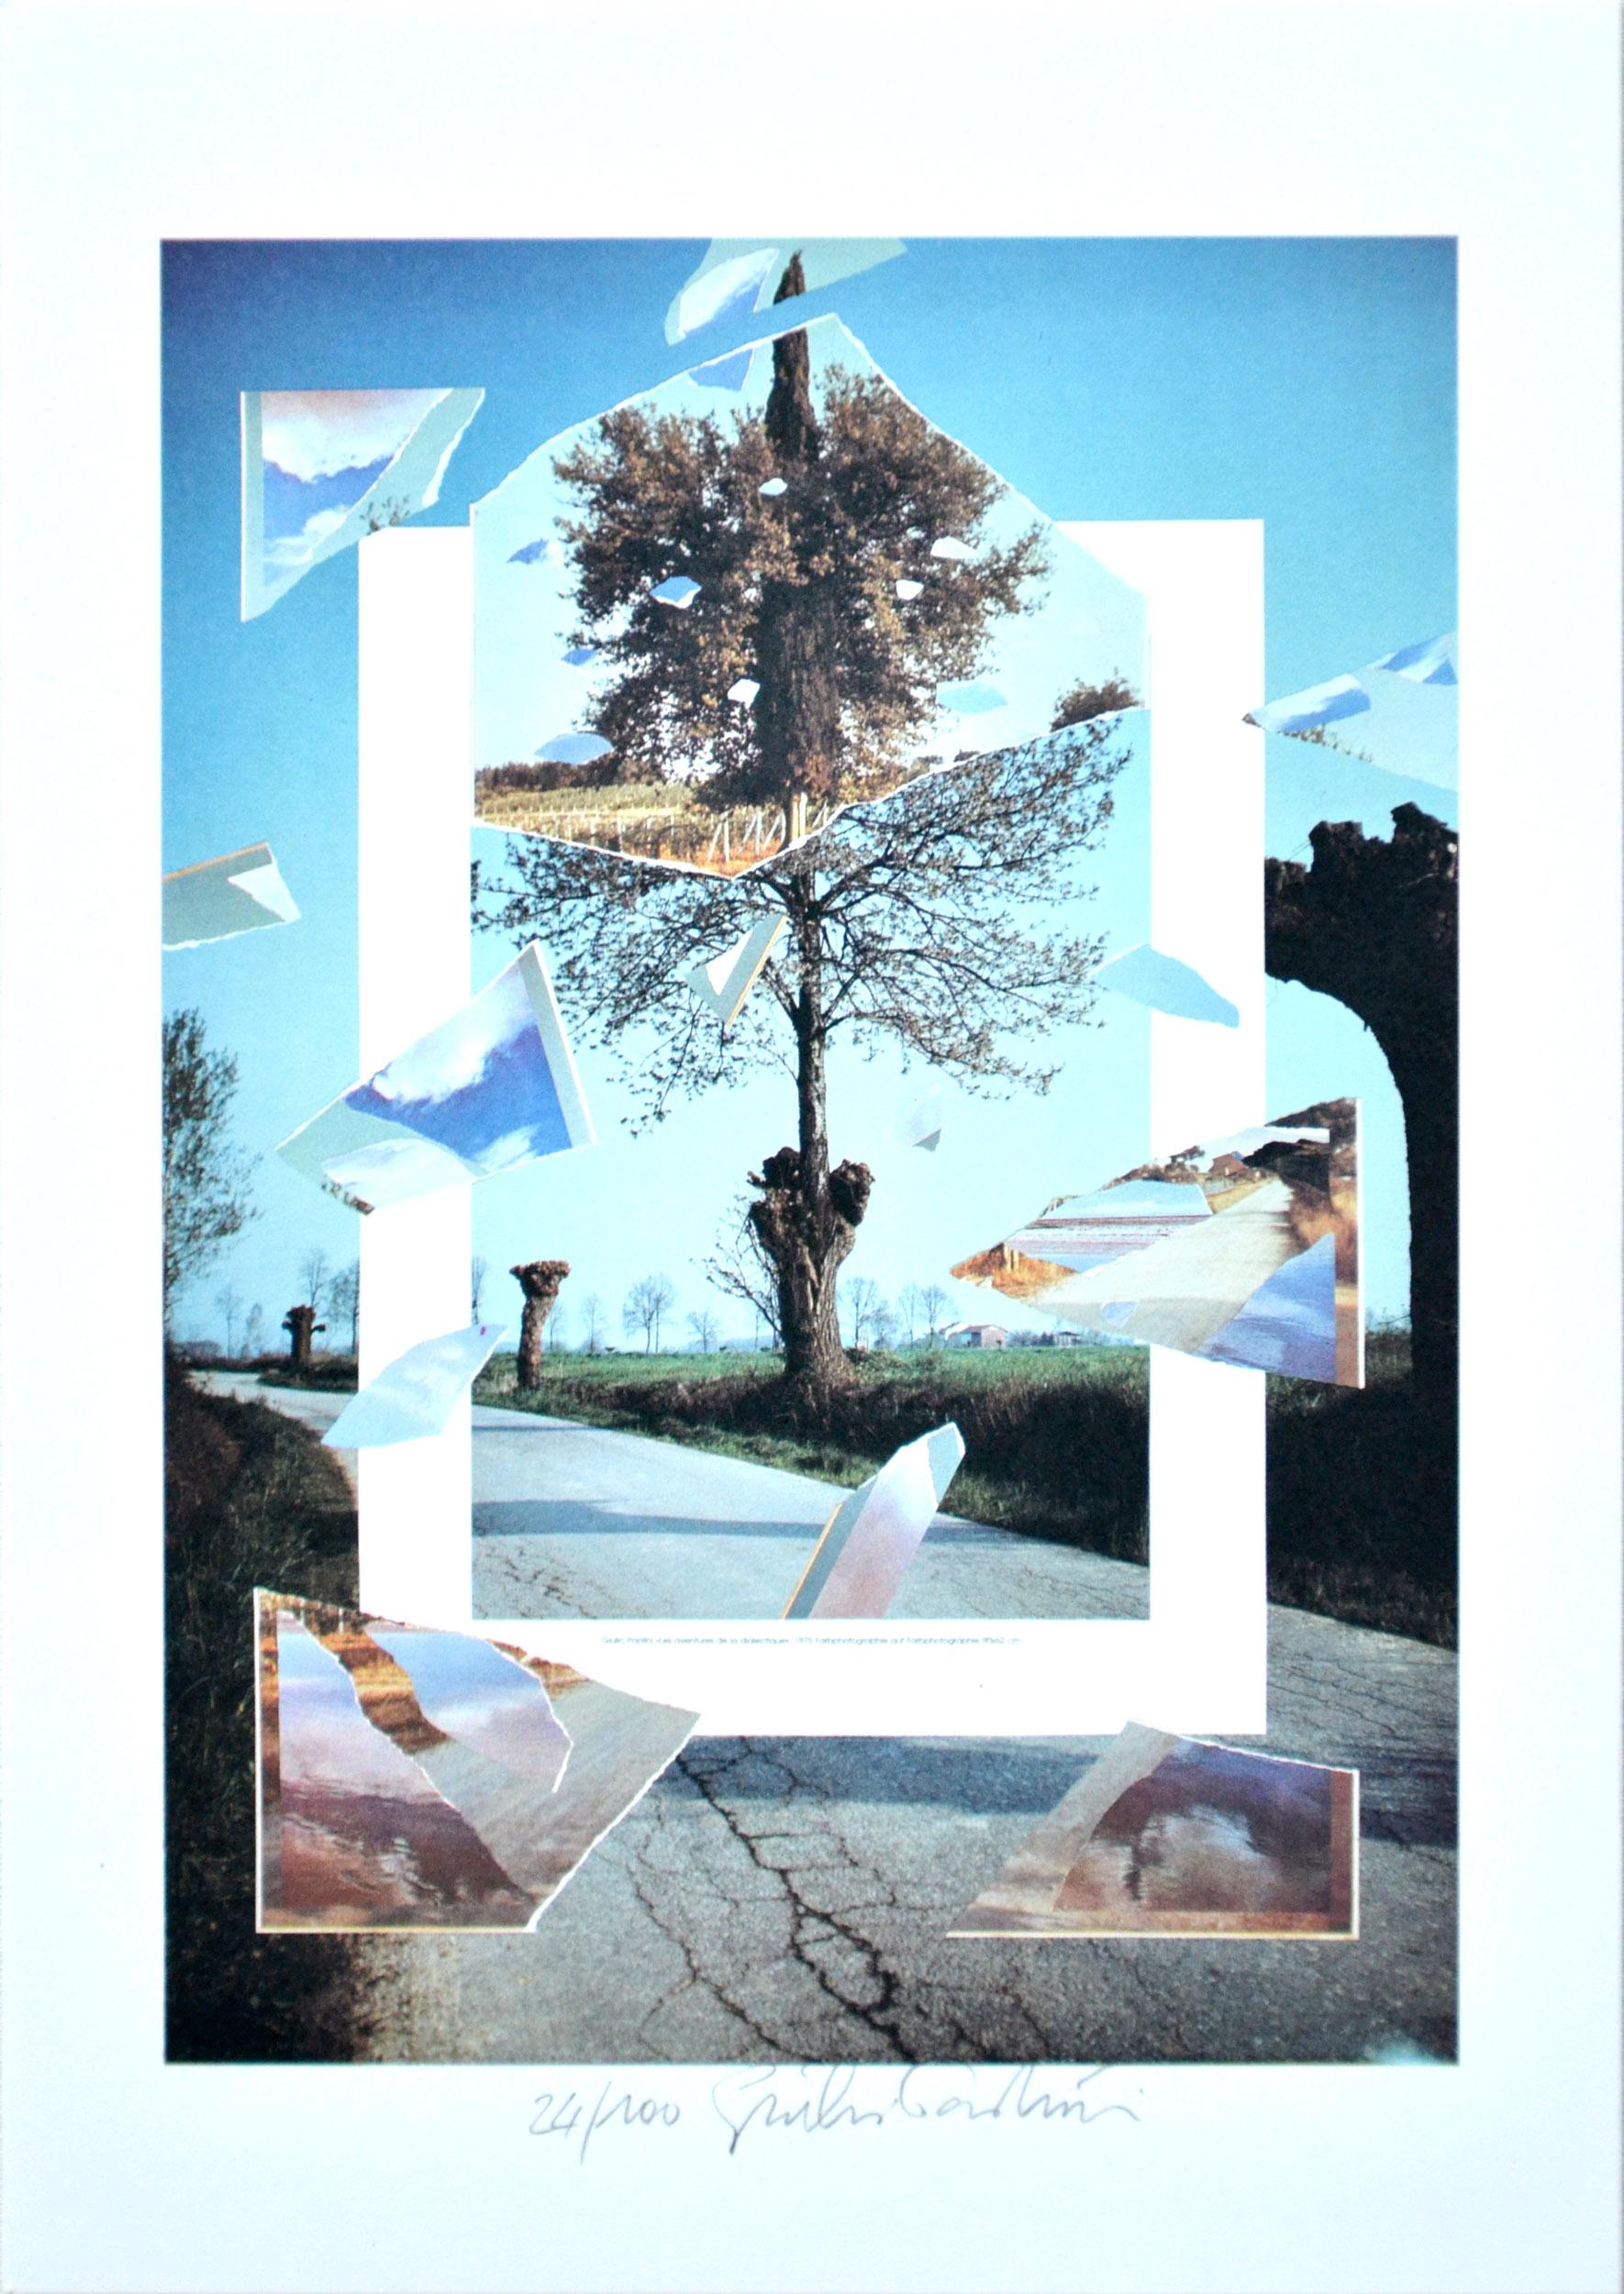 Paolini Giulio_les aventures de la dialectique_litografia 24-100_20x30cm_1975